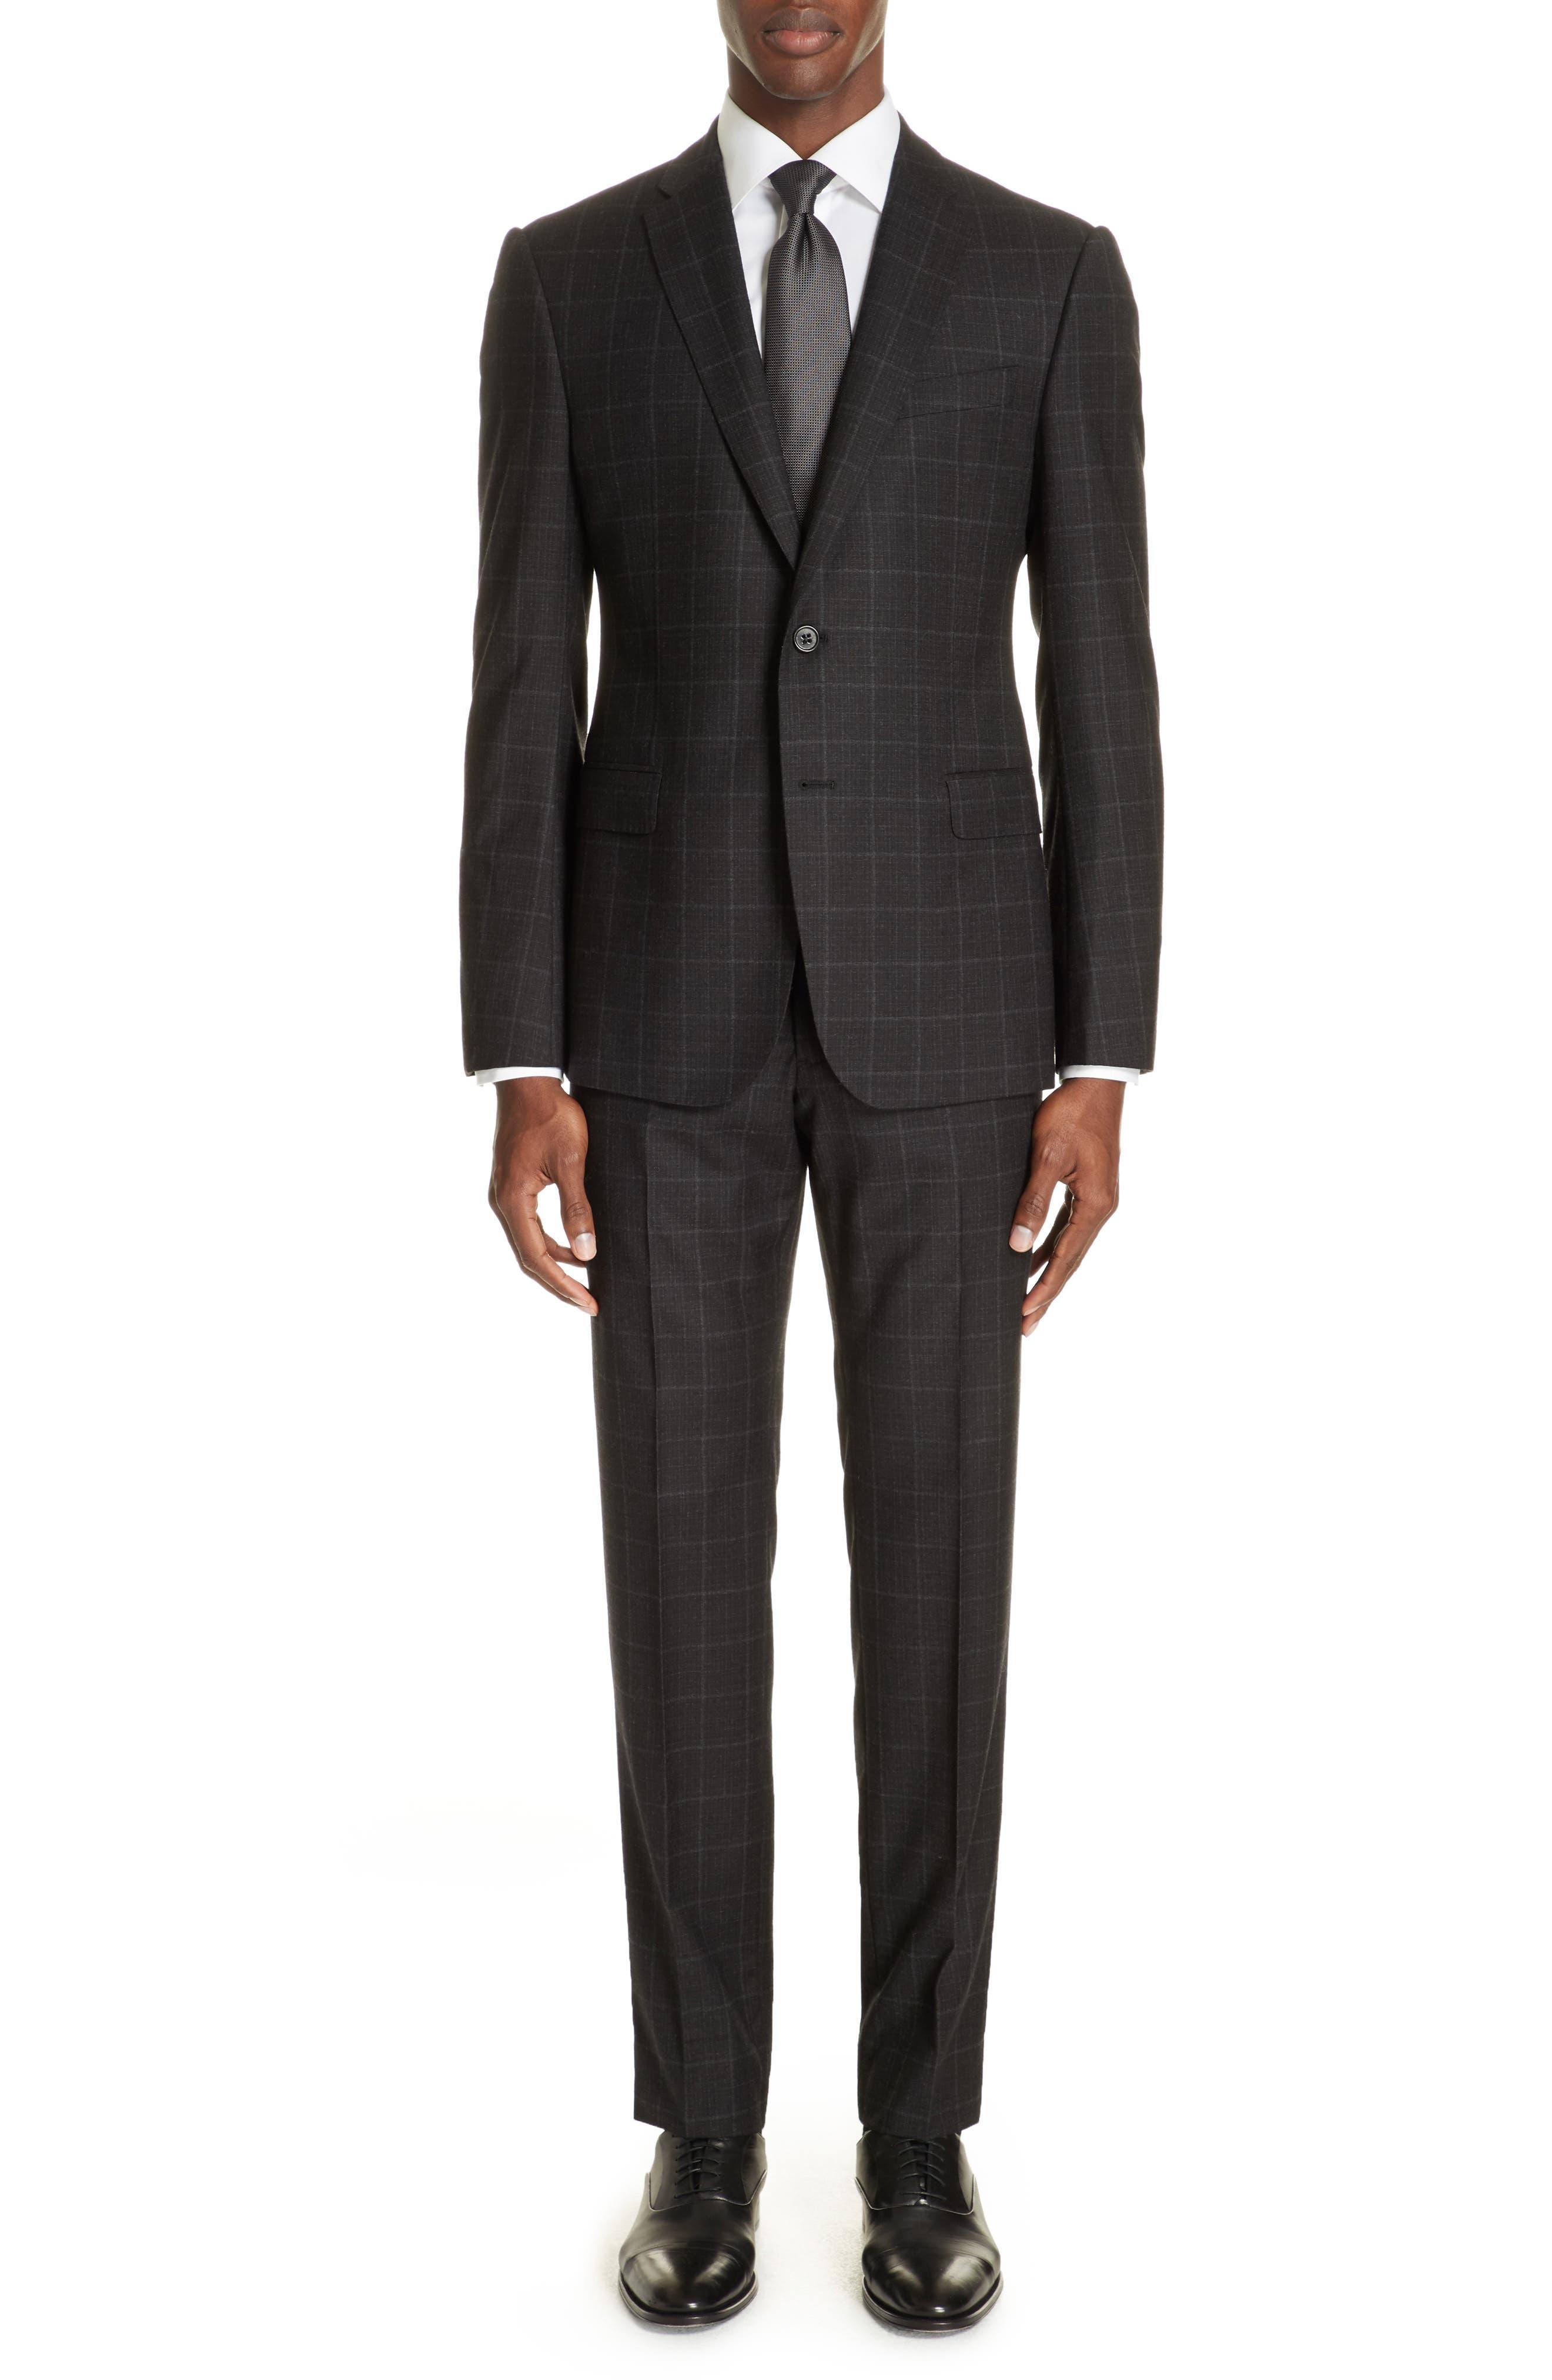 Men'S Windowpane Wool Two-Piece Suit in Charcoal